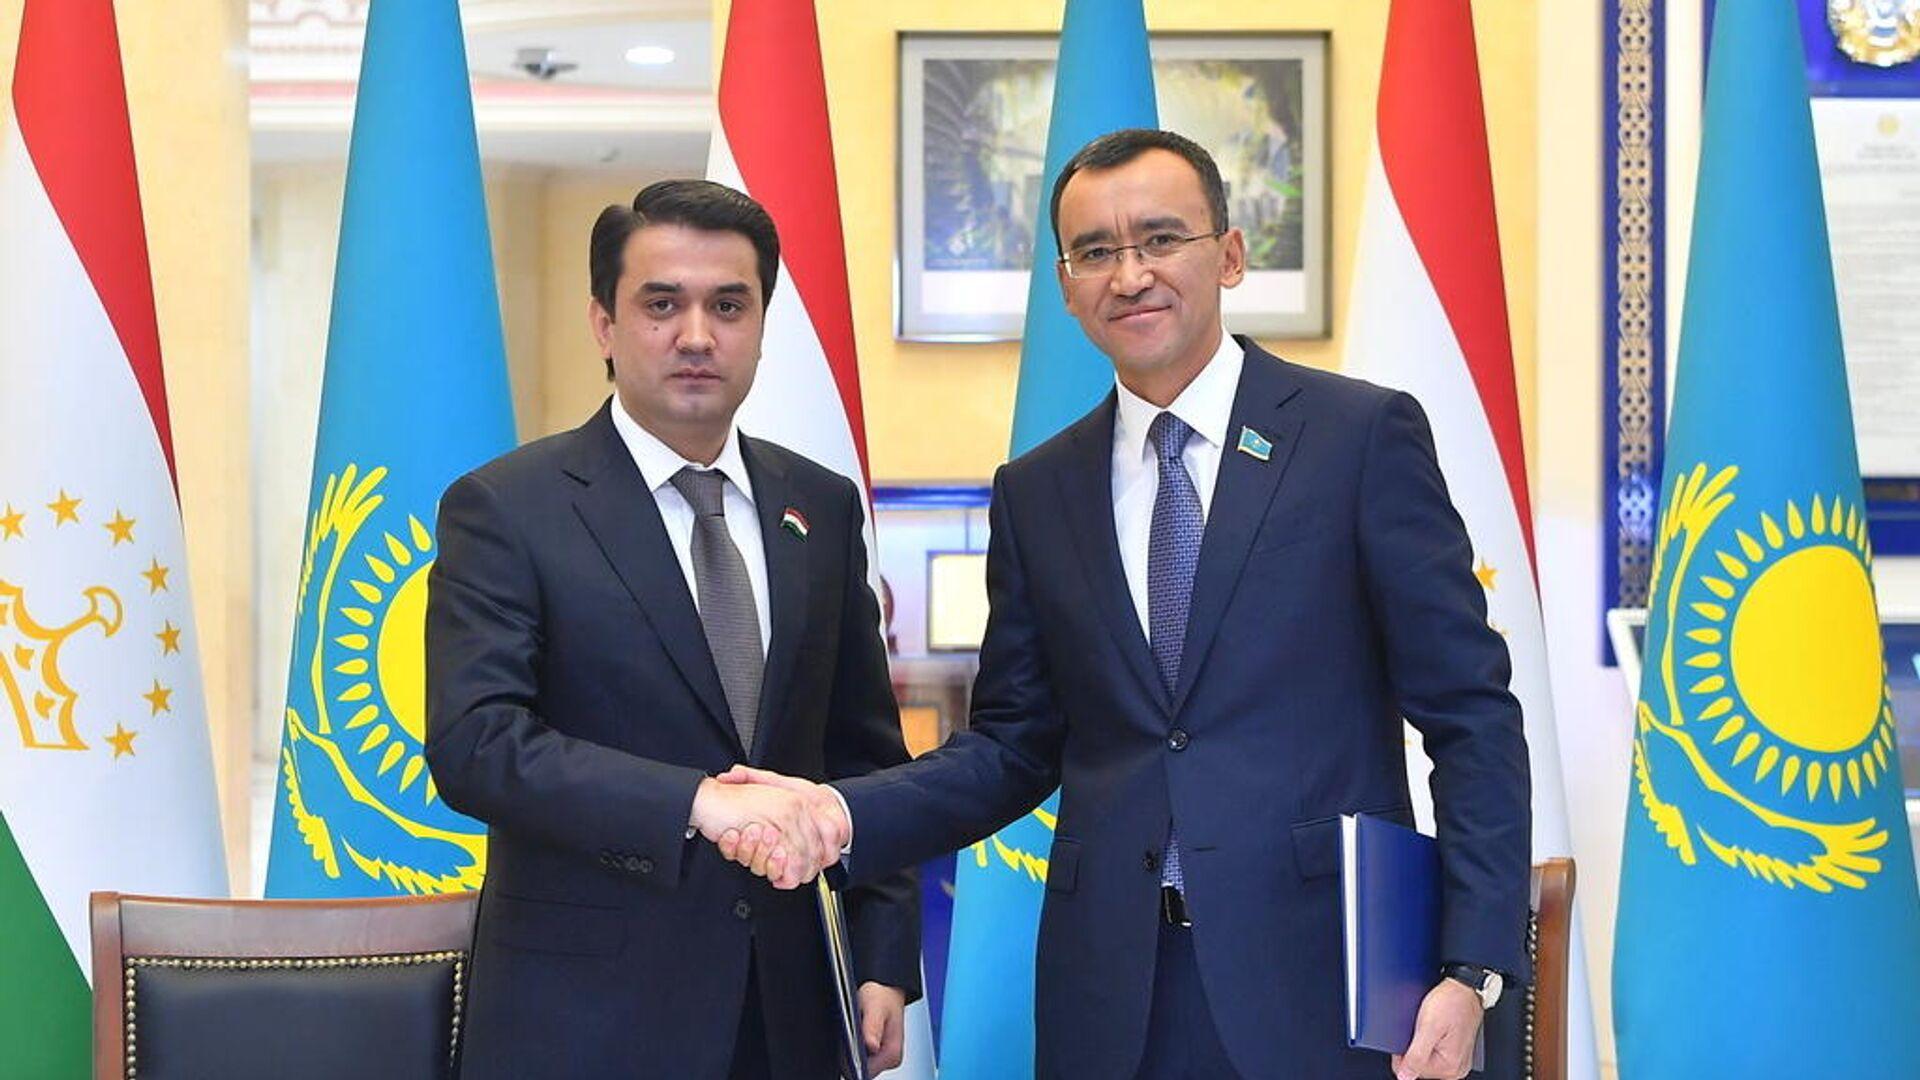 Спикер Сената Маулен Ашимбаев встретился с Председателем Маджлиси милли Маджлиси Оли Республики Таджикистан Рустам Эмомал - Sputnik Таджикистан, 1920, 23.09.2021